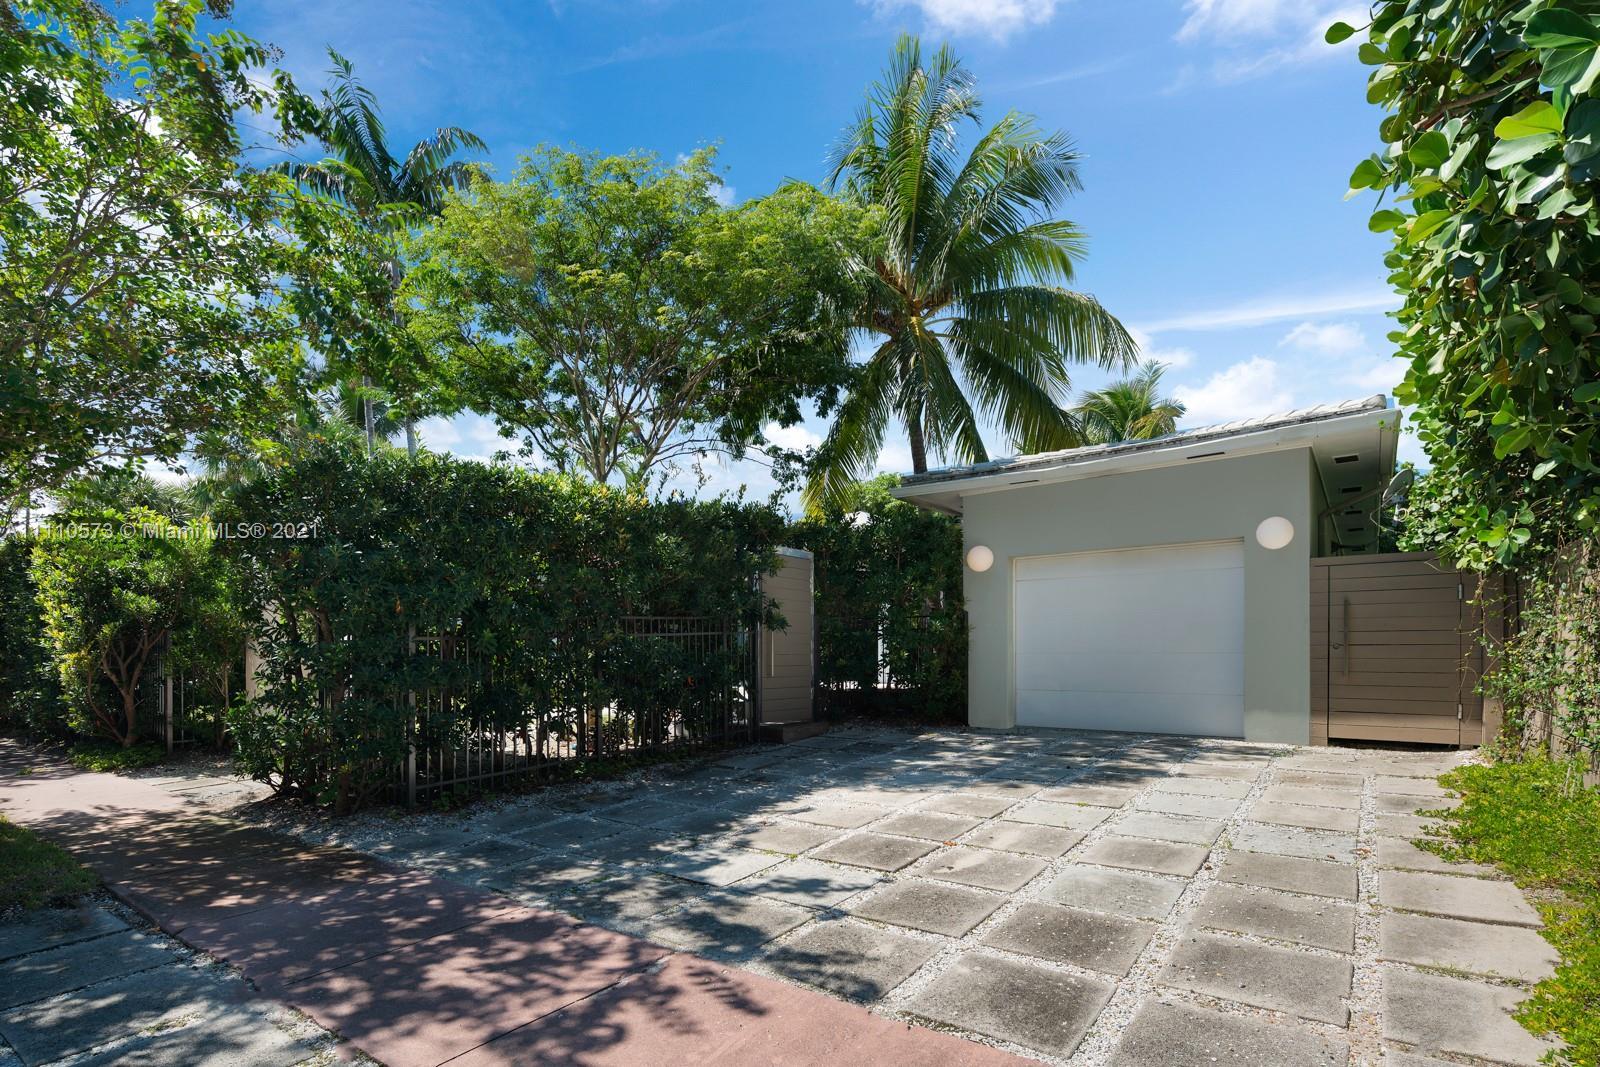 Flamingo Terrace - 2520 Flamingo Dr, Miami Beach, FL 33140